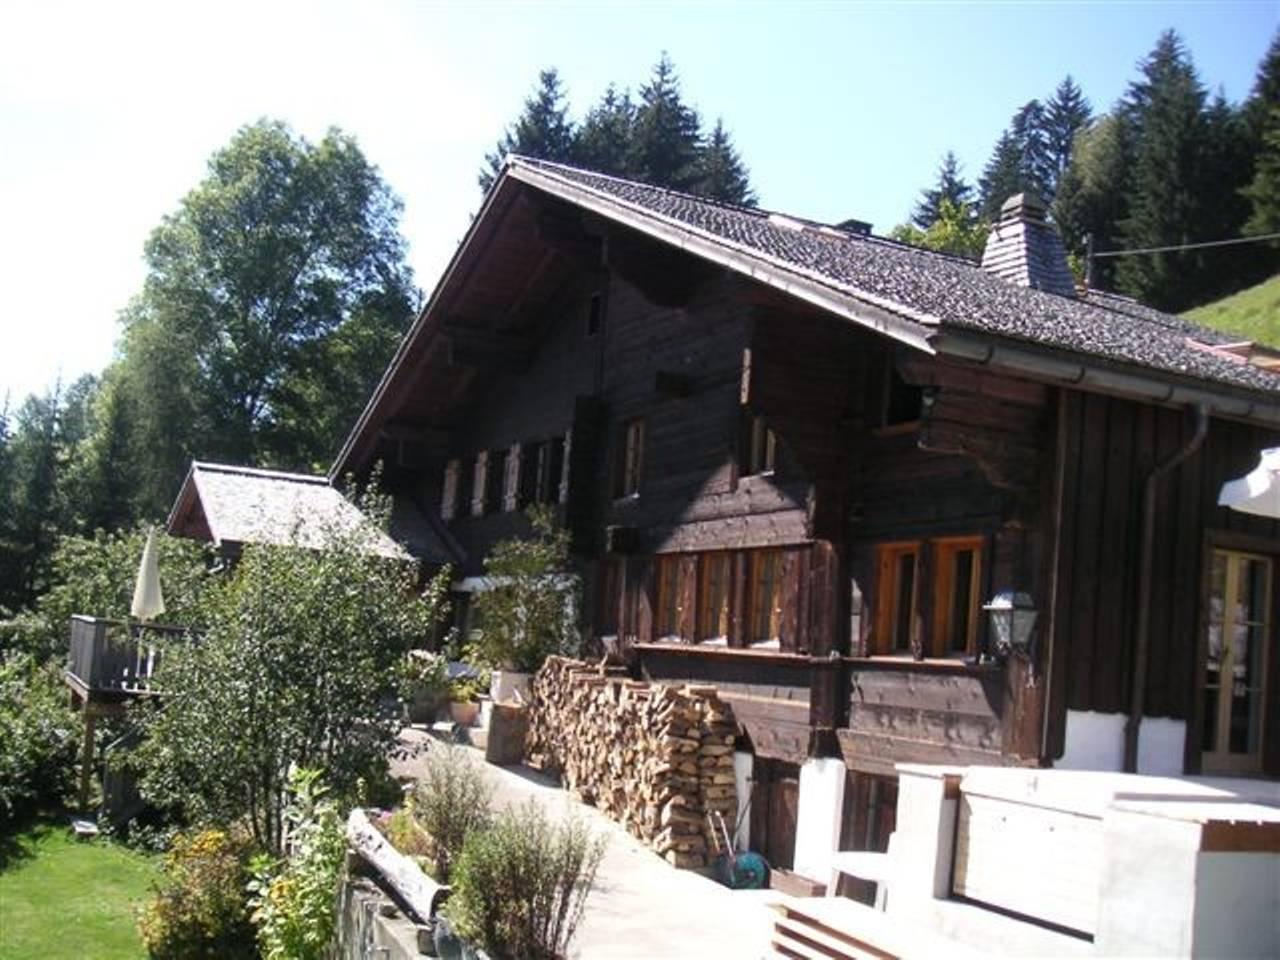 Apartment The Alps Wonder Chalet photo 25568371